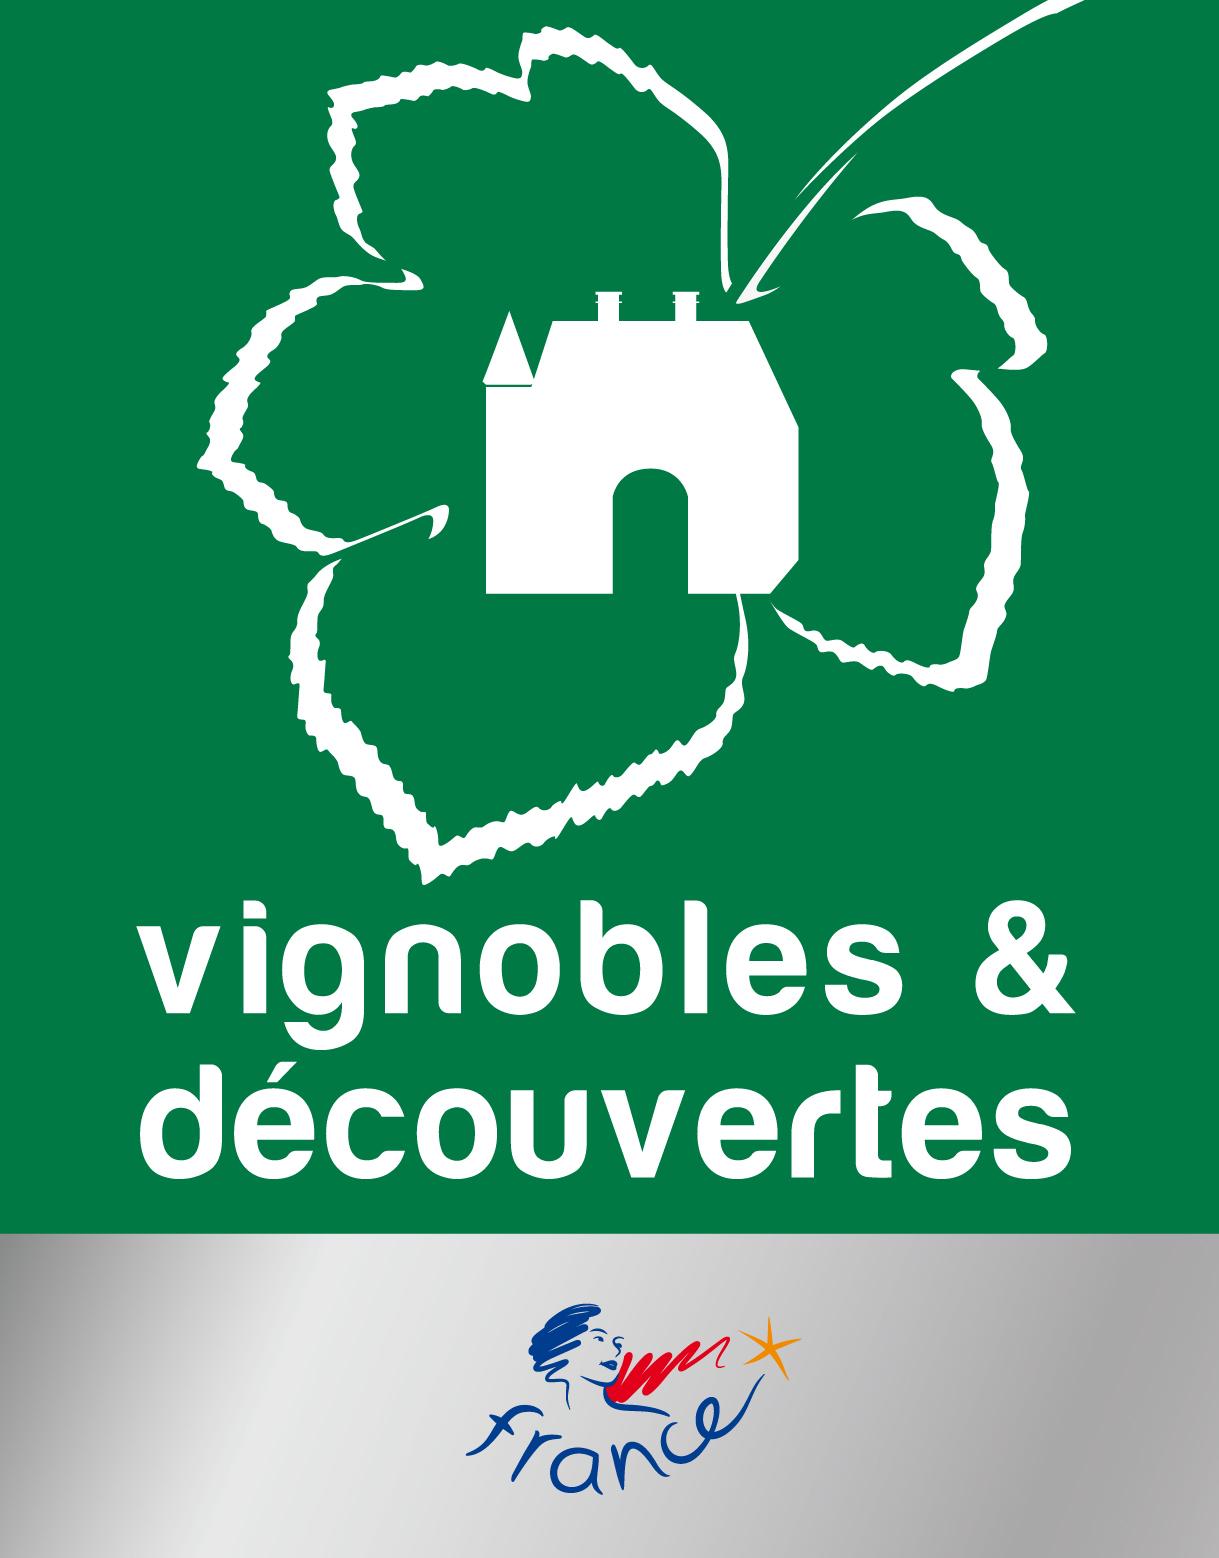 LOGO_VIGNOBLESETDECOUVERTES_CONTOUR-BLANC-Web.jpg